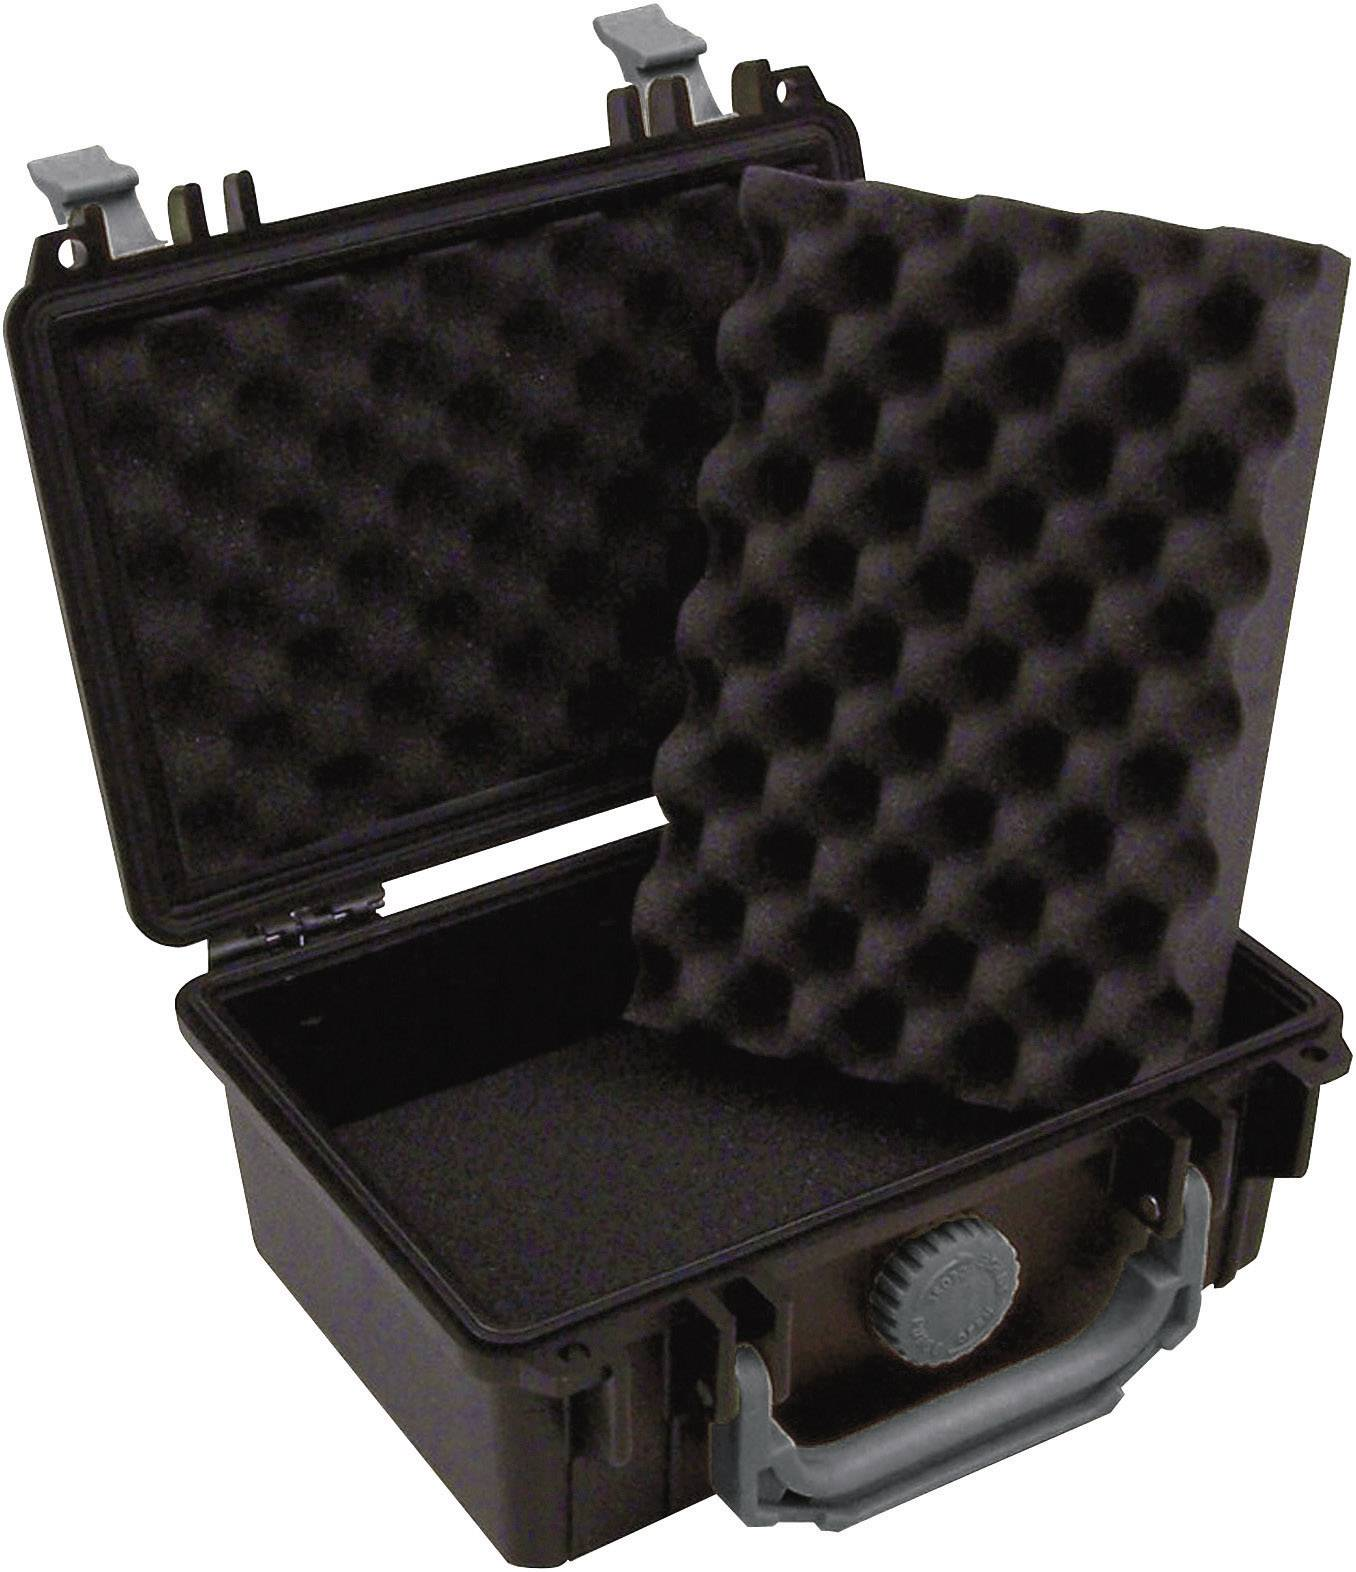 Outdoorový kufor Viso WAT210, 210 x 167 x 90 mm